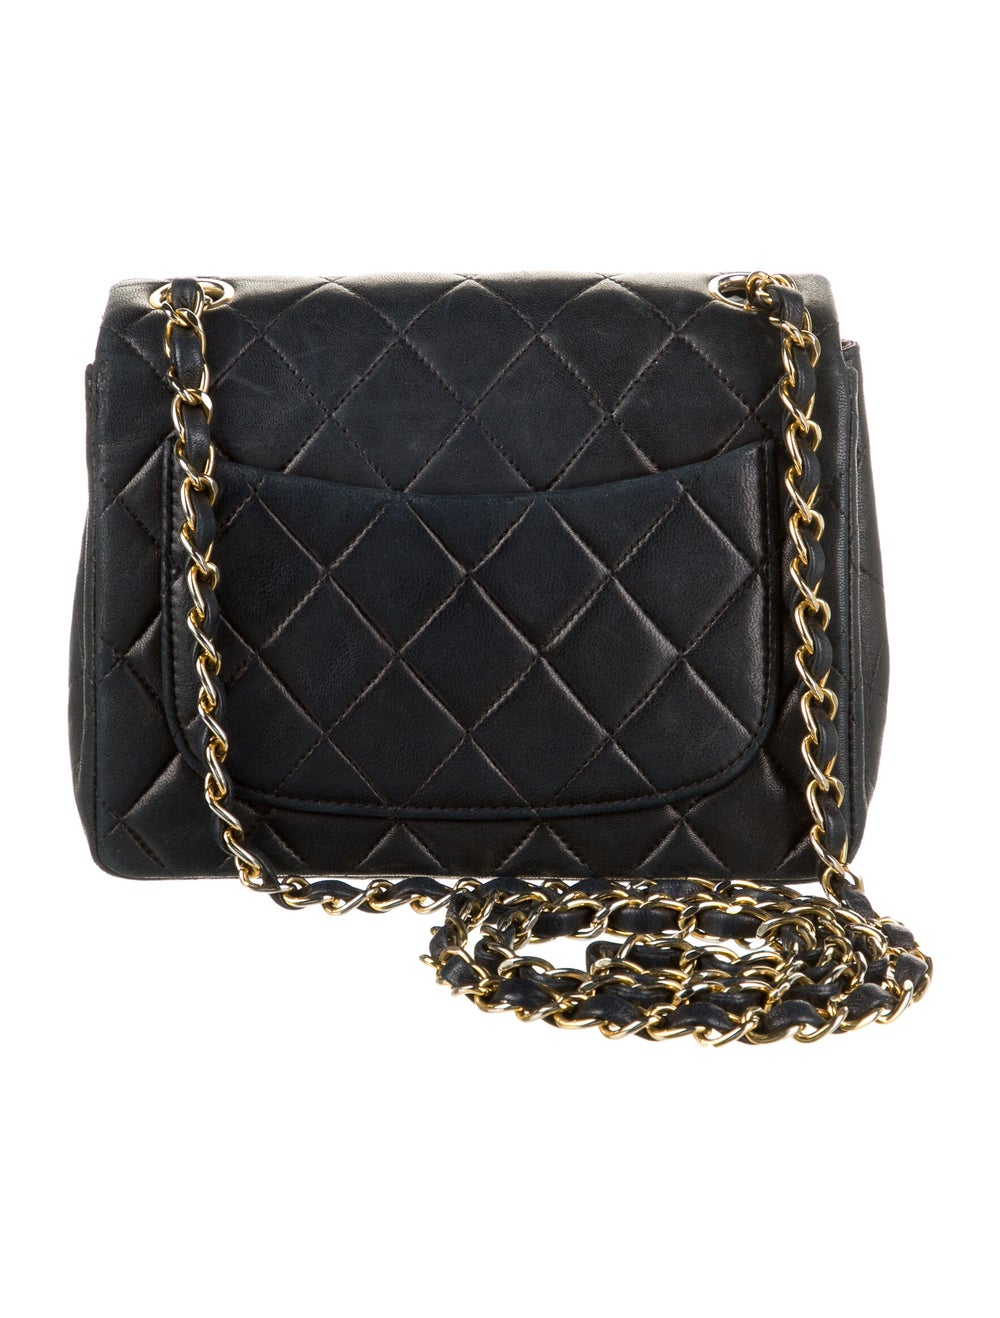 Chanel Vintage Classic Mini Square Flap Bag Blue - image 4